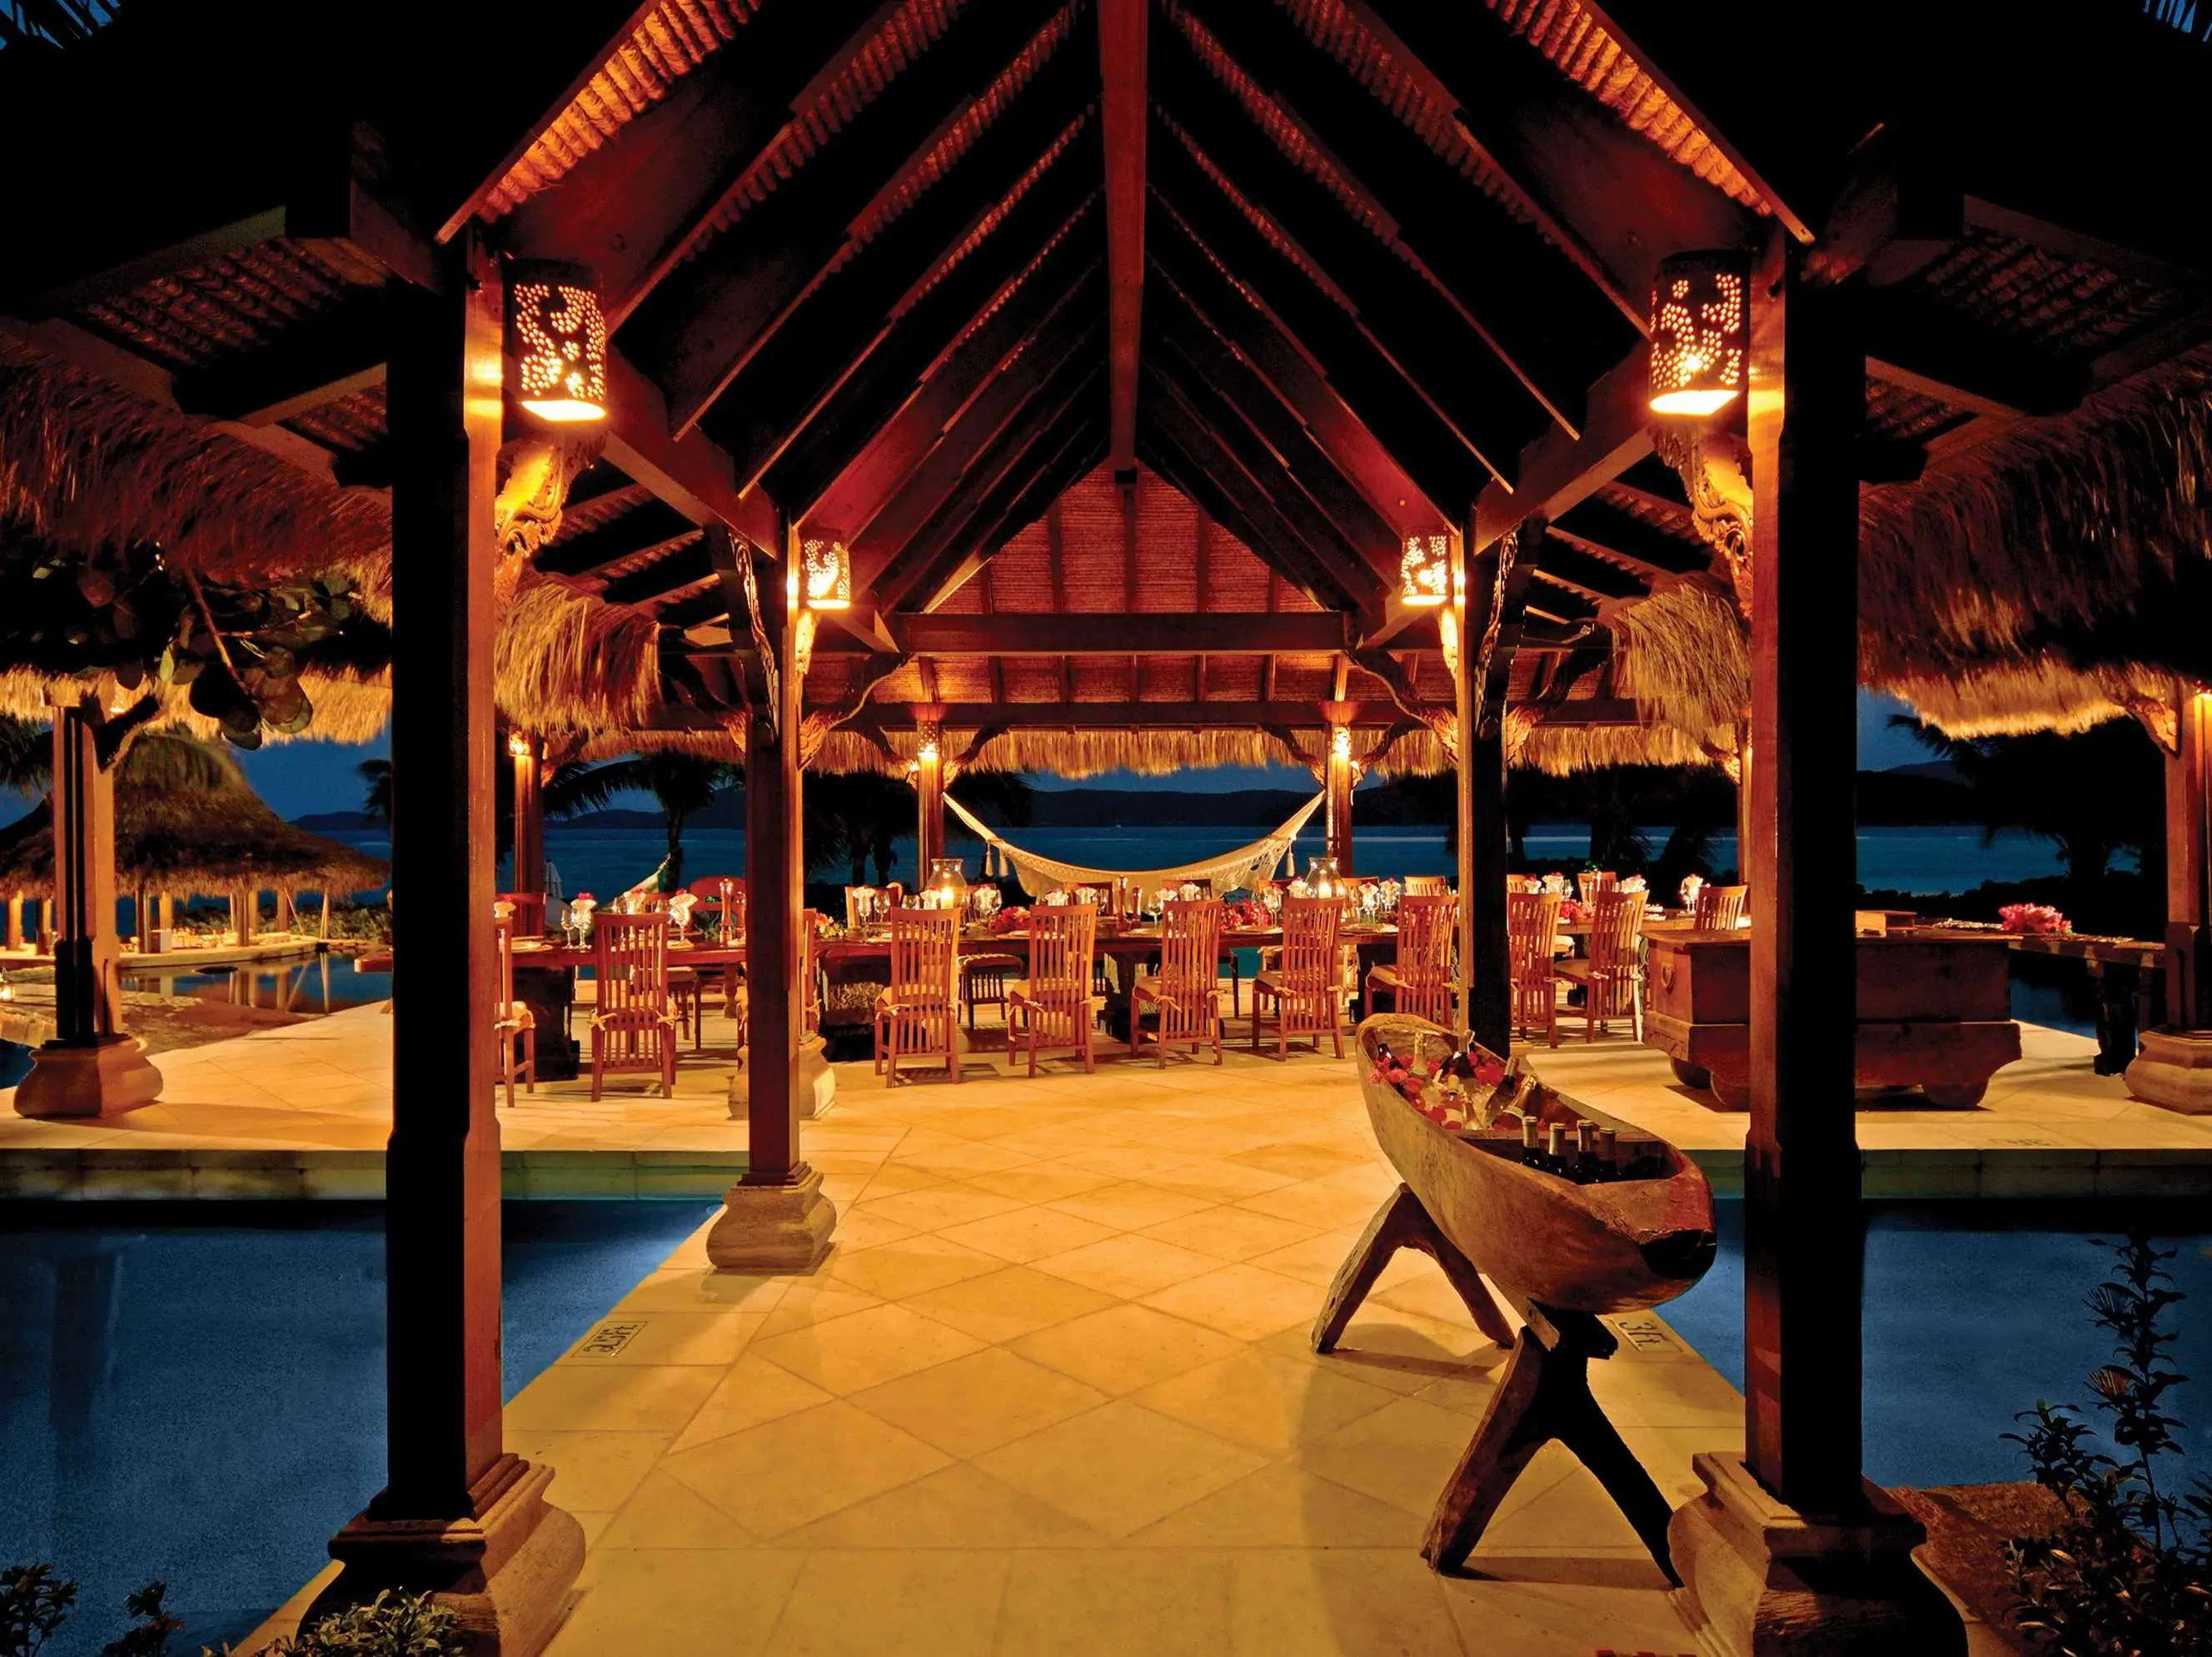 Spend a night at Richard Branson's ultra-luxurious Caribbean retreat, Necker Island.